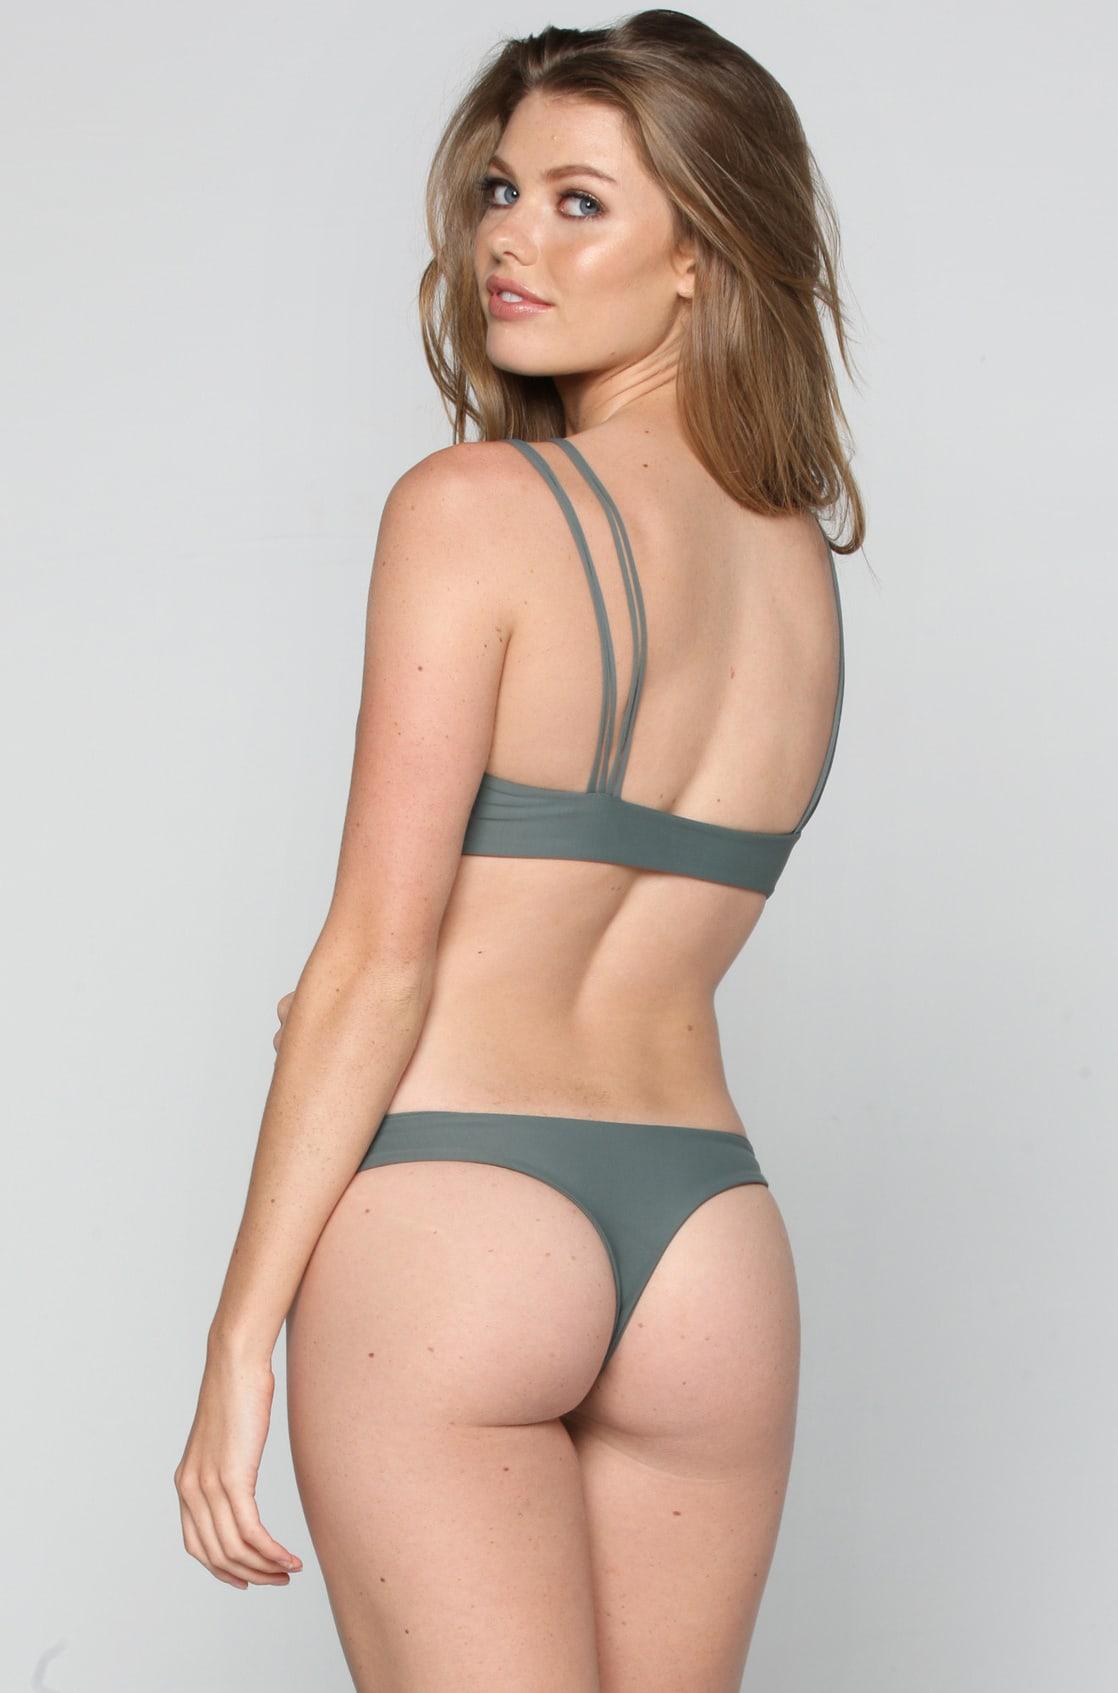 Selfie McKenna Berkley naked (68 foto and video), Tits, Cleavage, Twitter, see through 2019